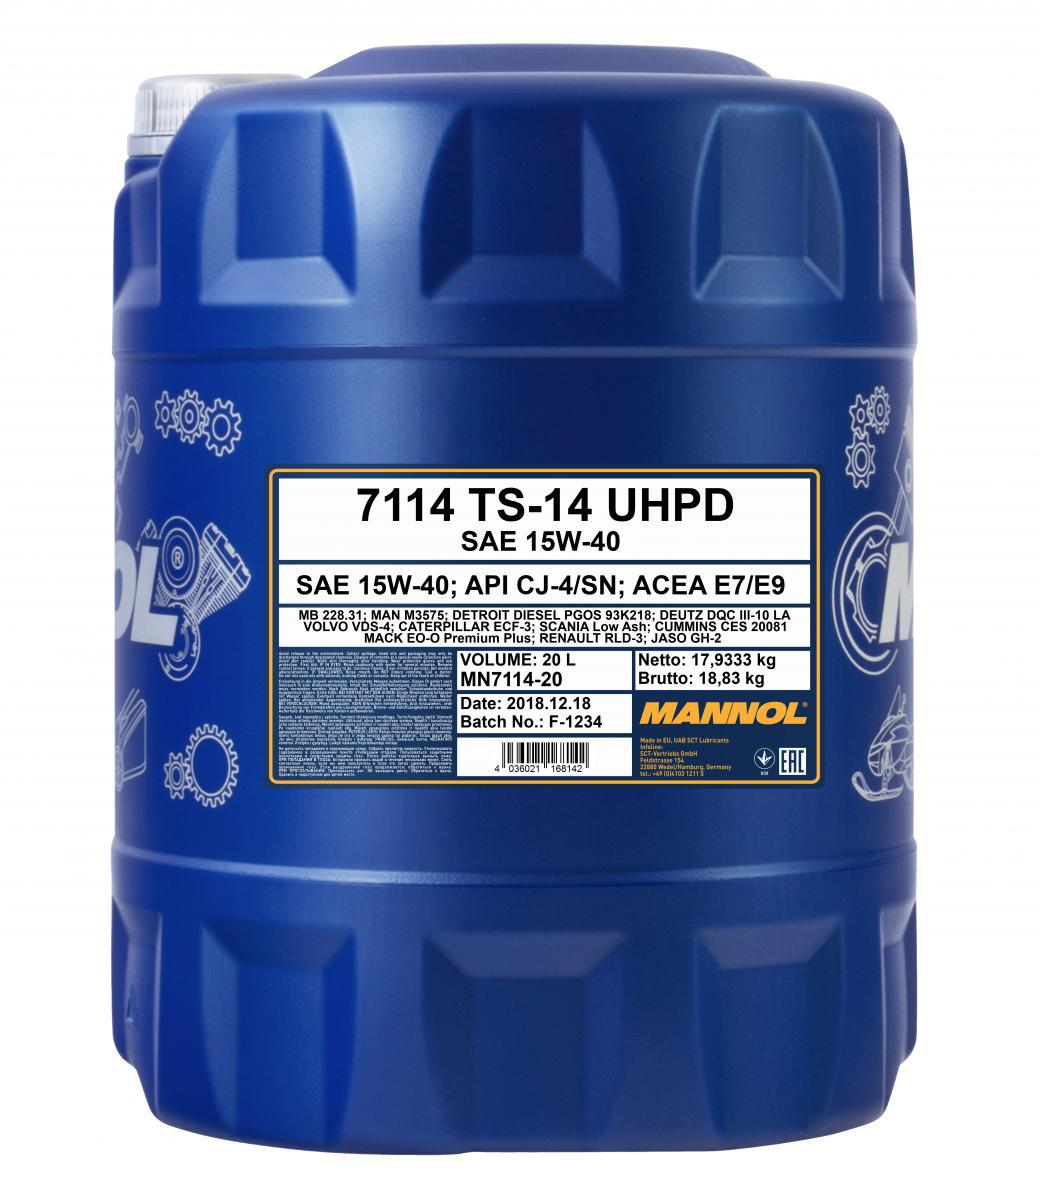 TS-14 UHPD 15W-40